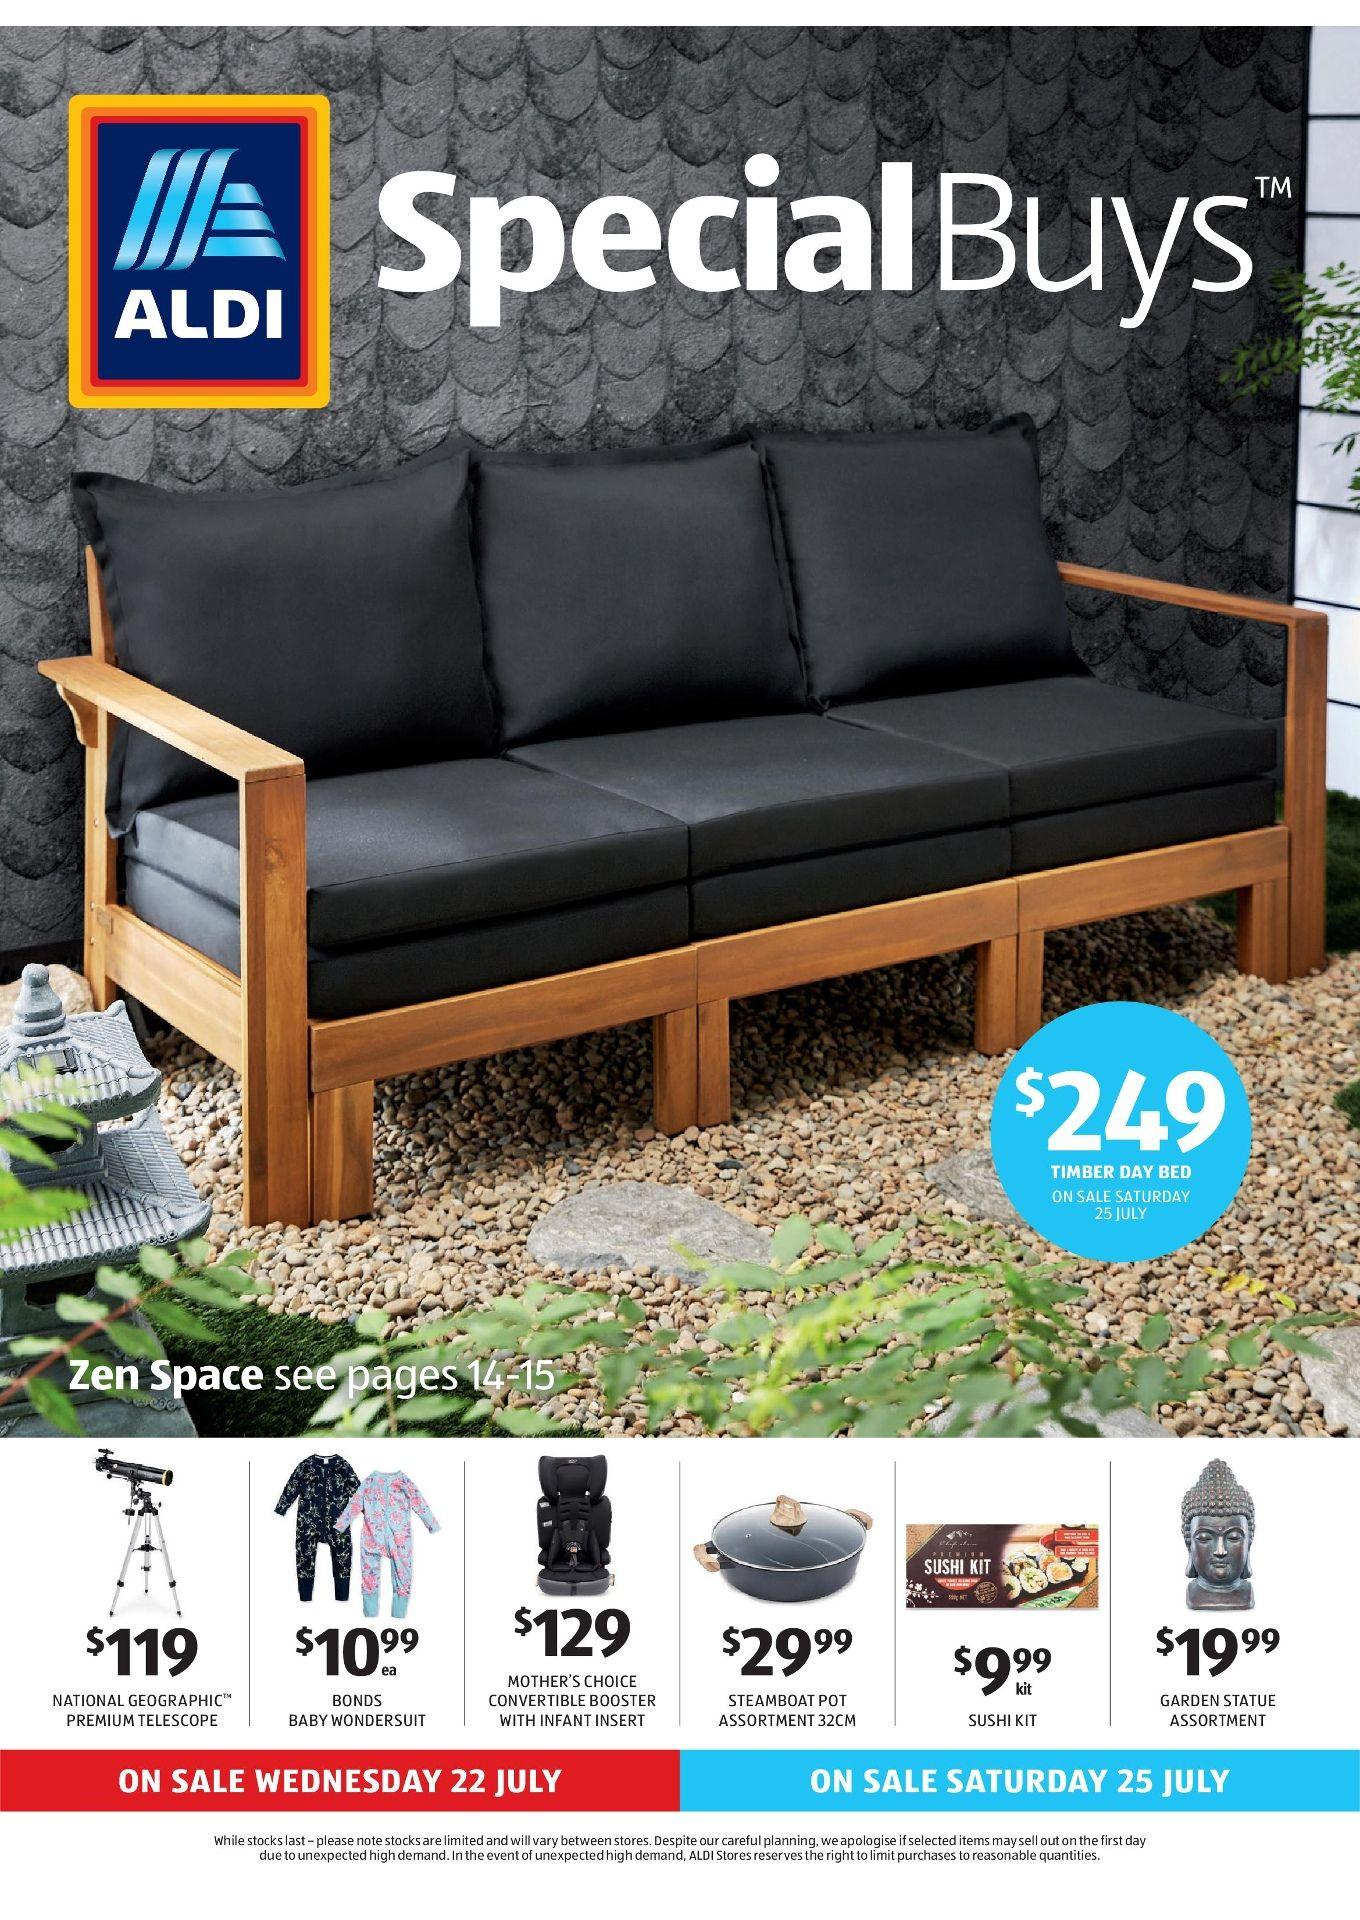 Aldi Catalogue Specials Week 30 22 July 28 July 2020 In 2020 Aldi Aldi Specials Weekly Specials